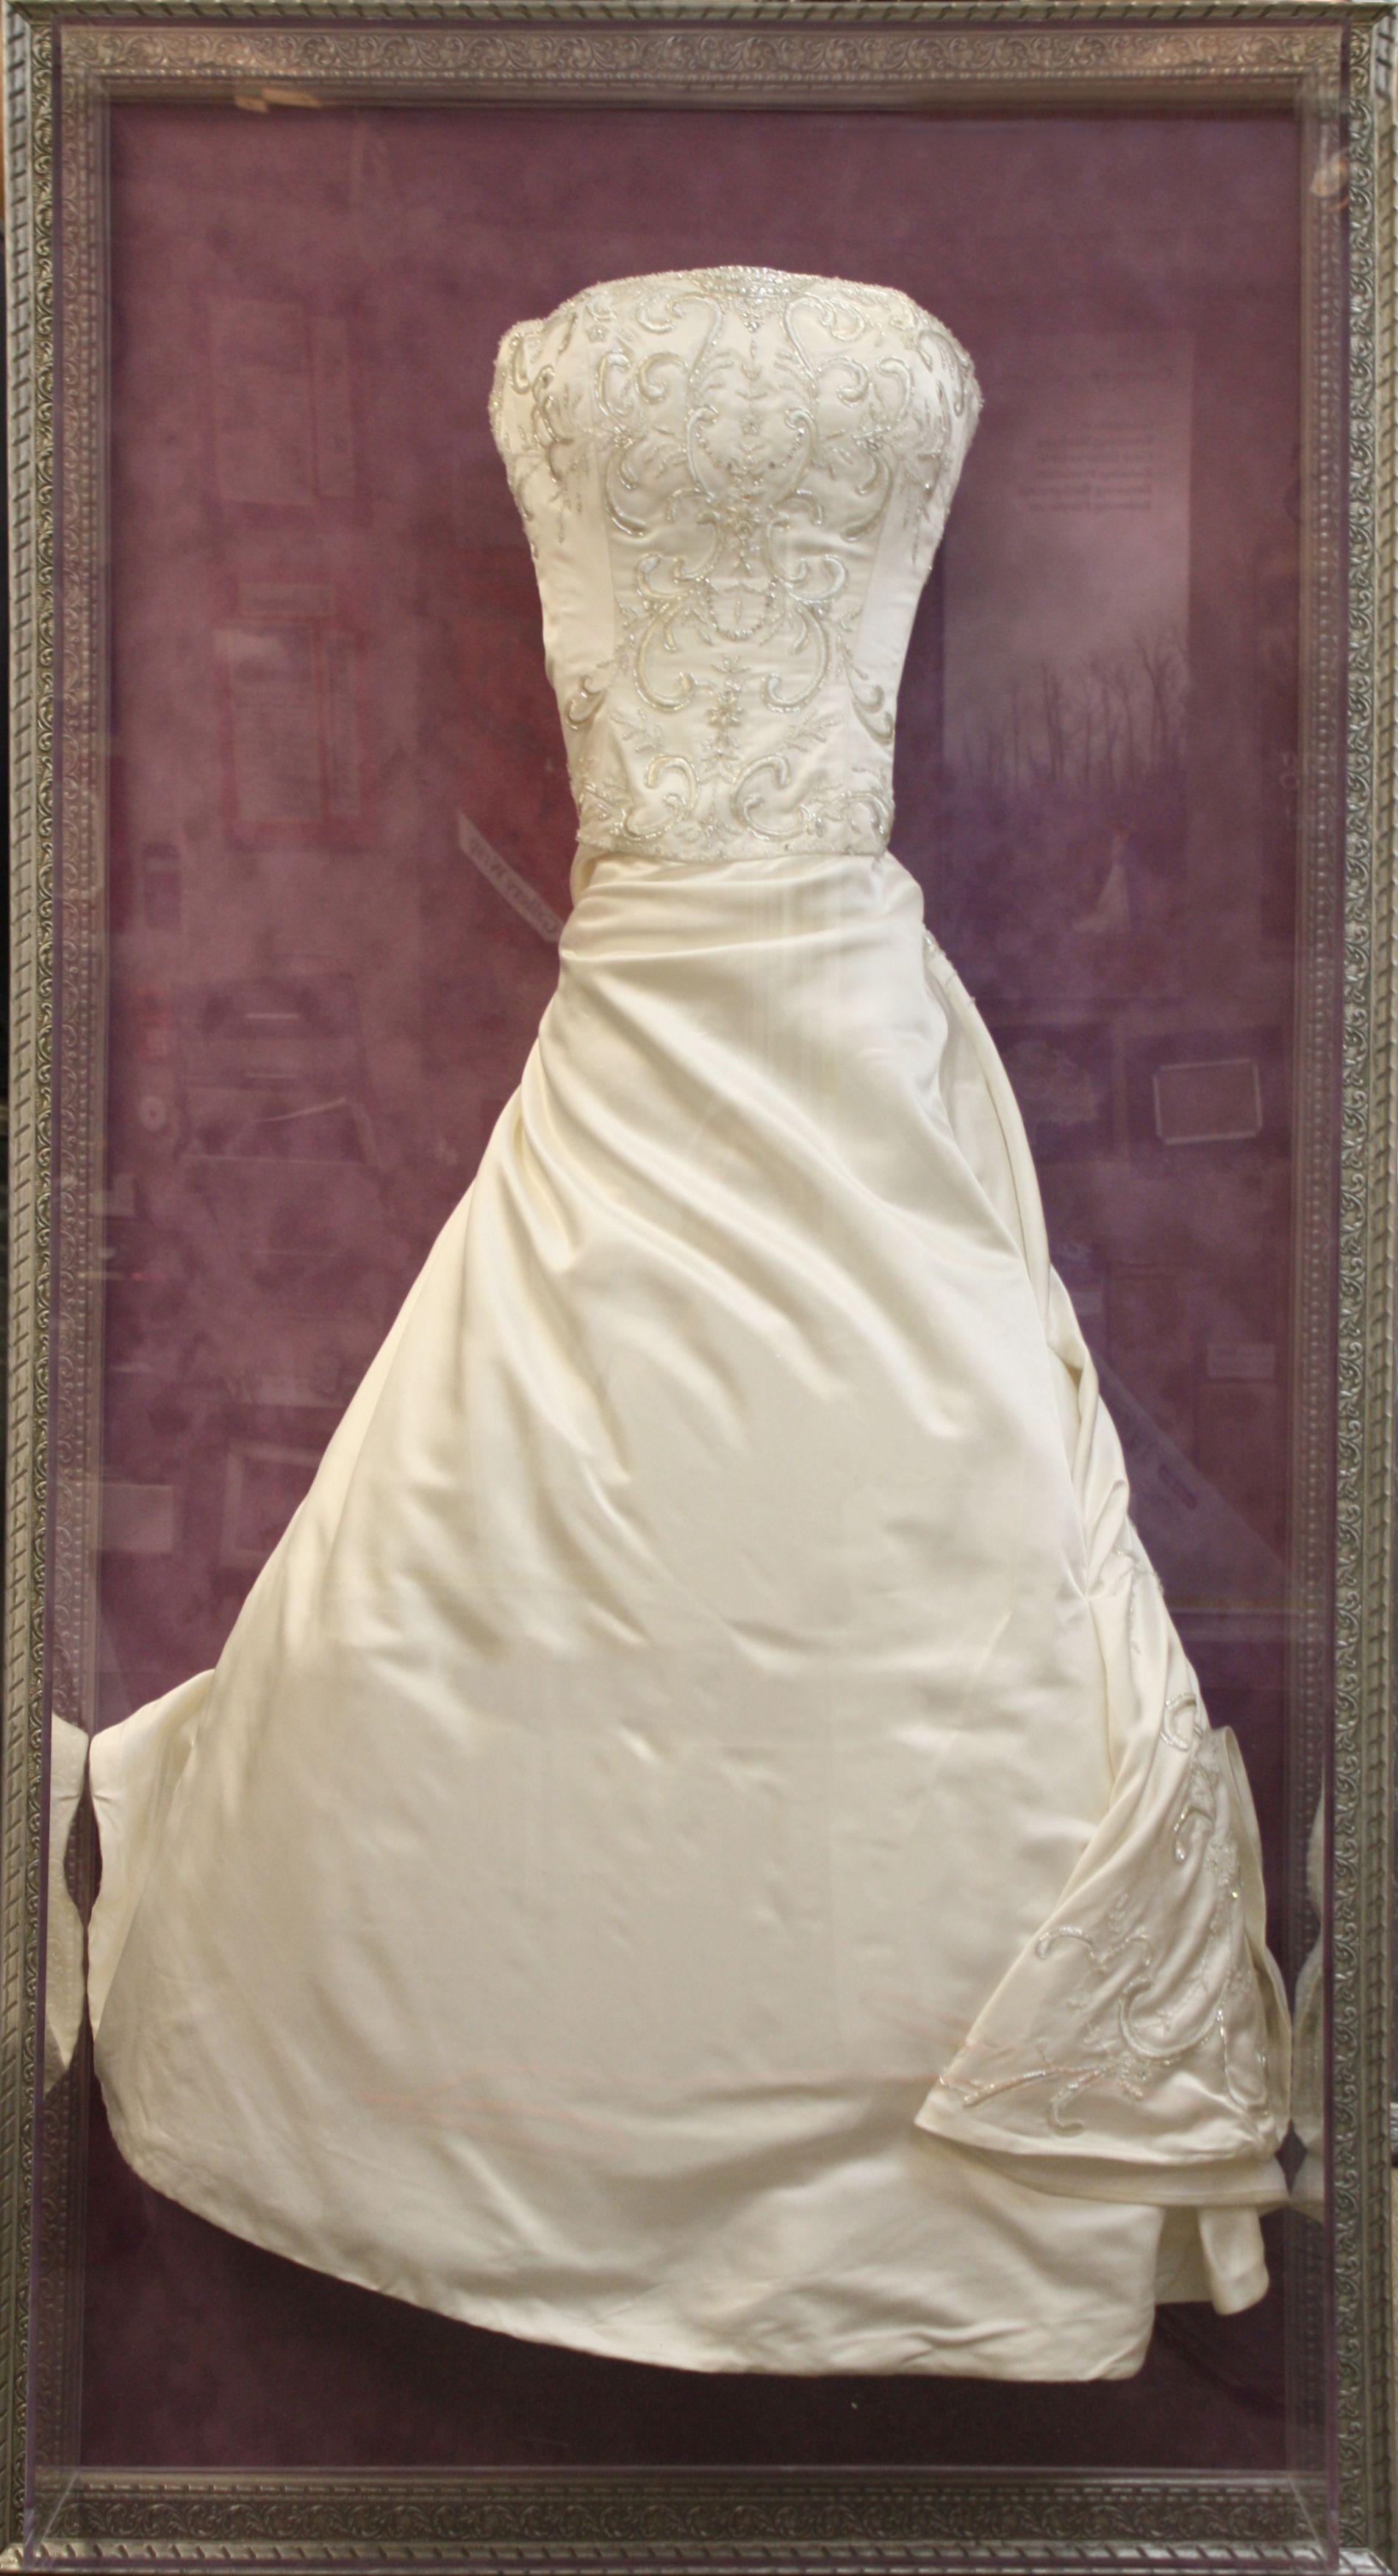 Wedding Dress Frame Inside A Custom Shadowbox Created In Central NJ At Art  U0026 Frame Express